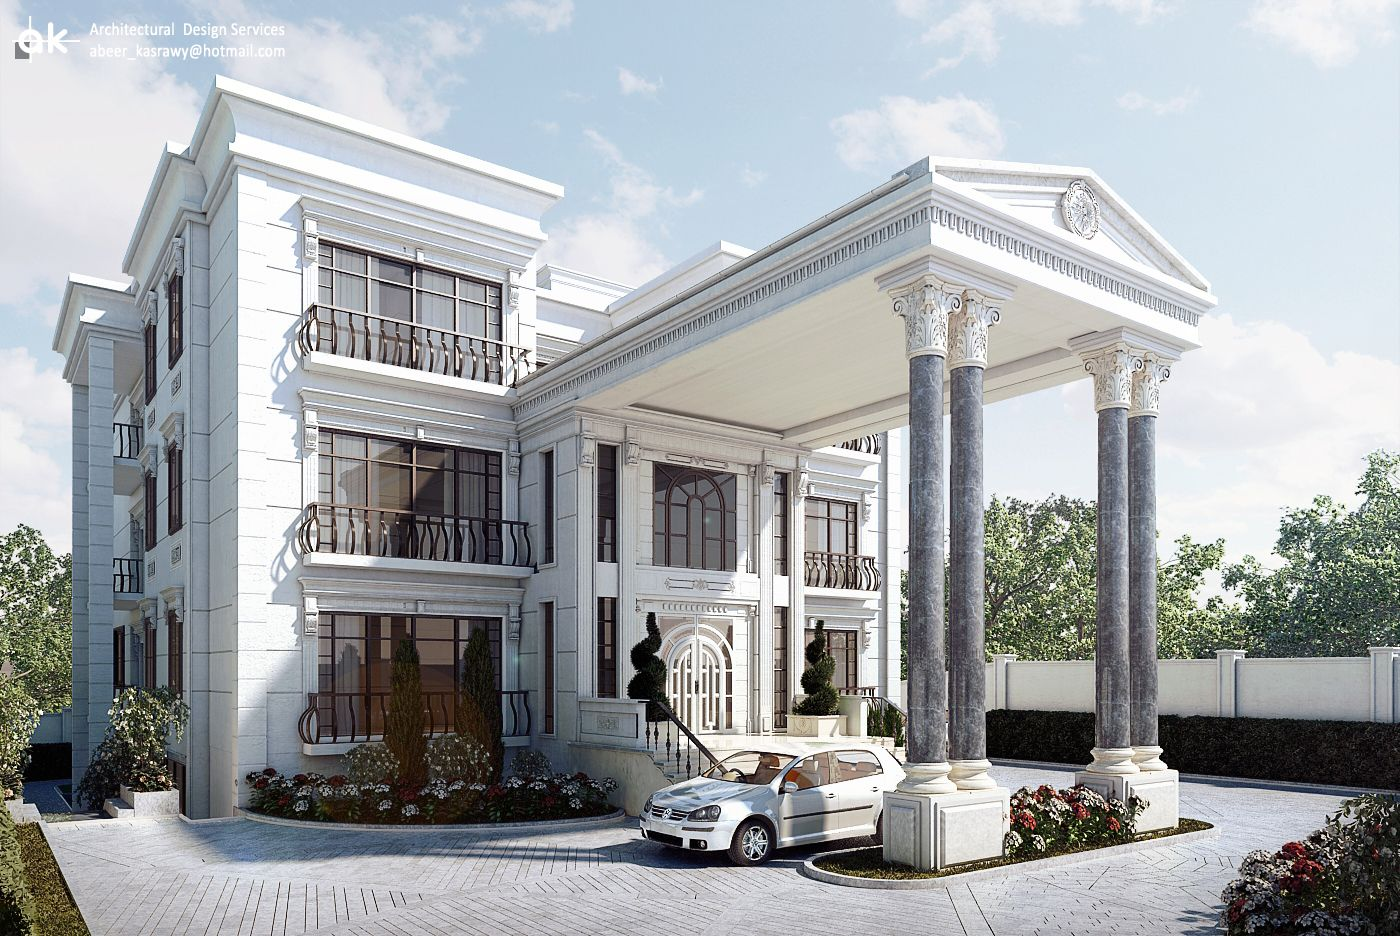 Exterior: Classic Villa Exterior By Kasrawy.deviantart.com On